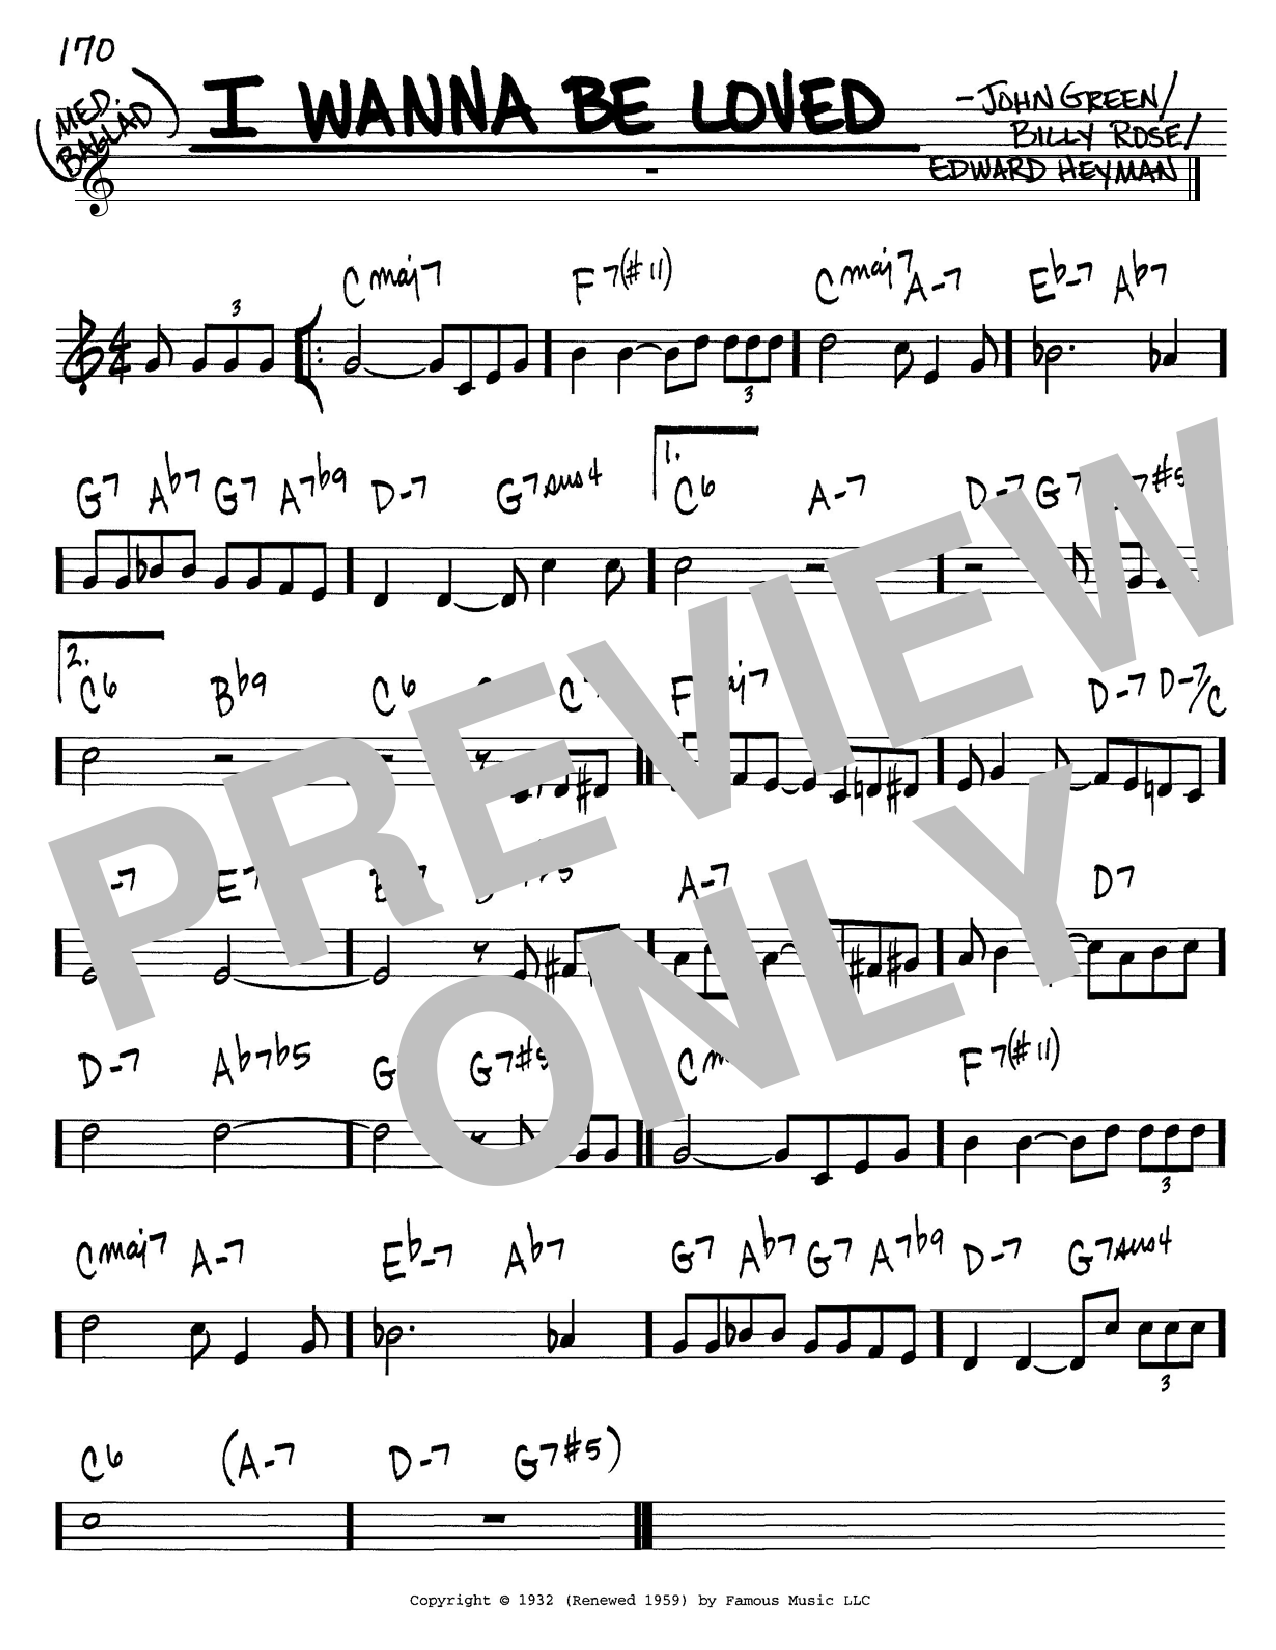 I Wanna Be Loved sheet music